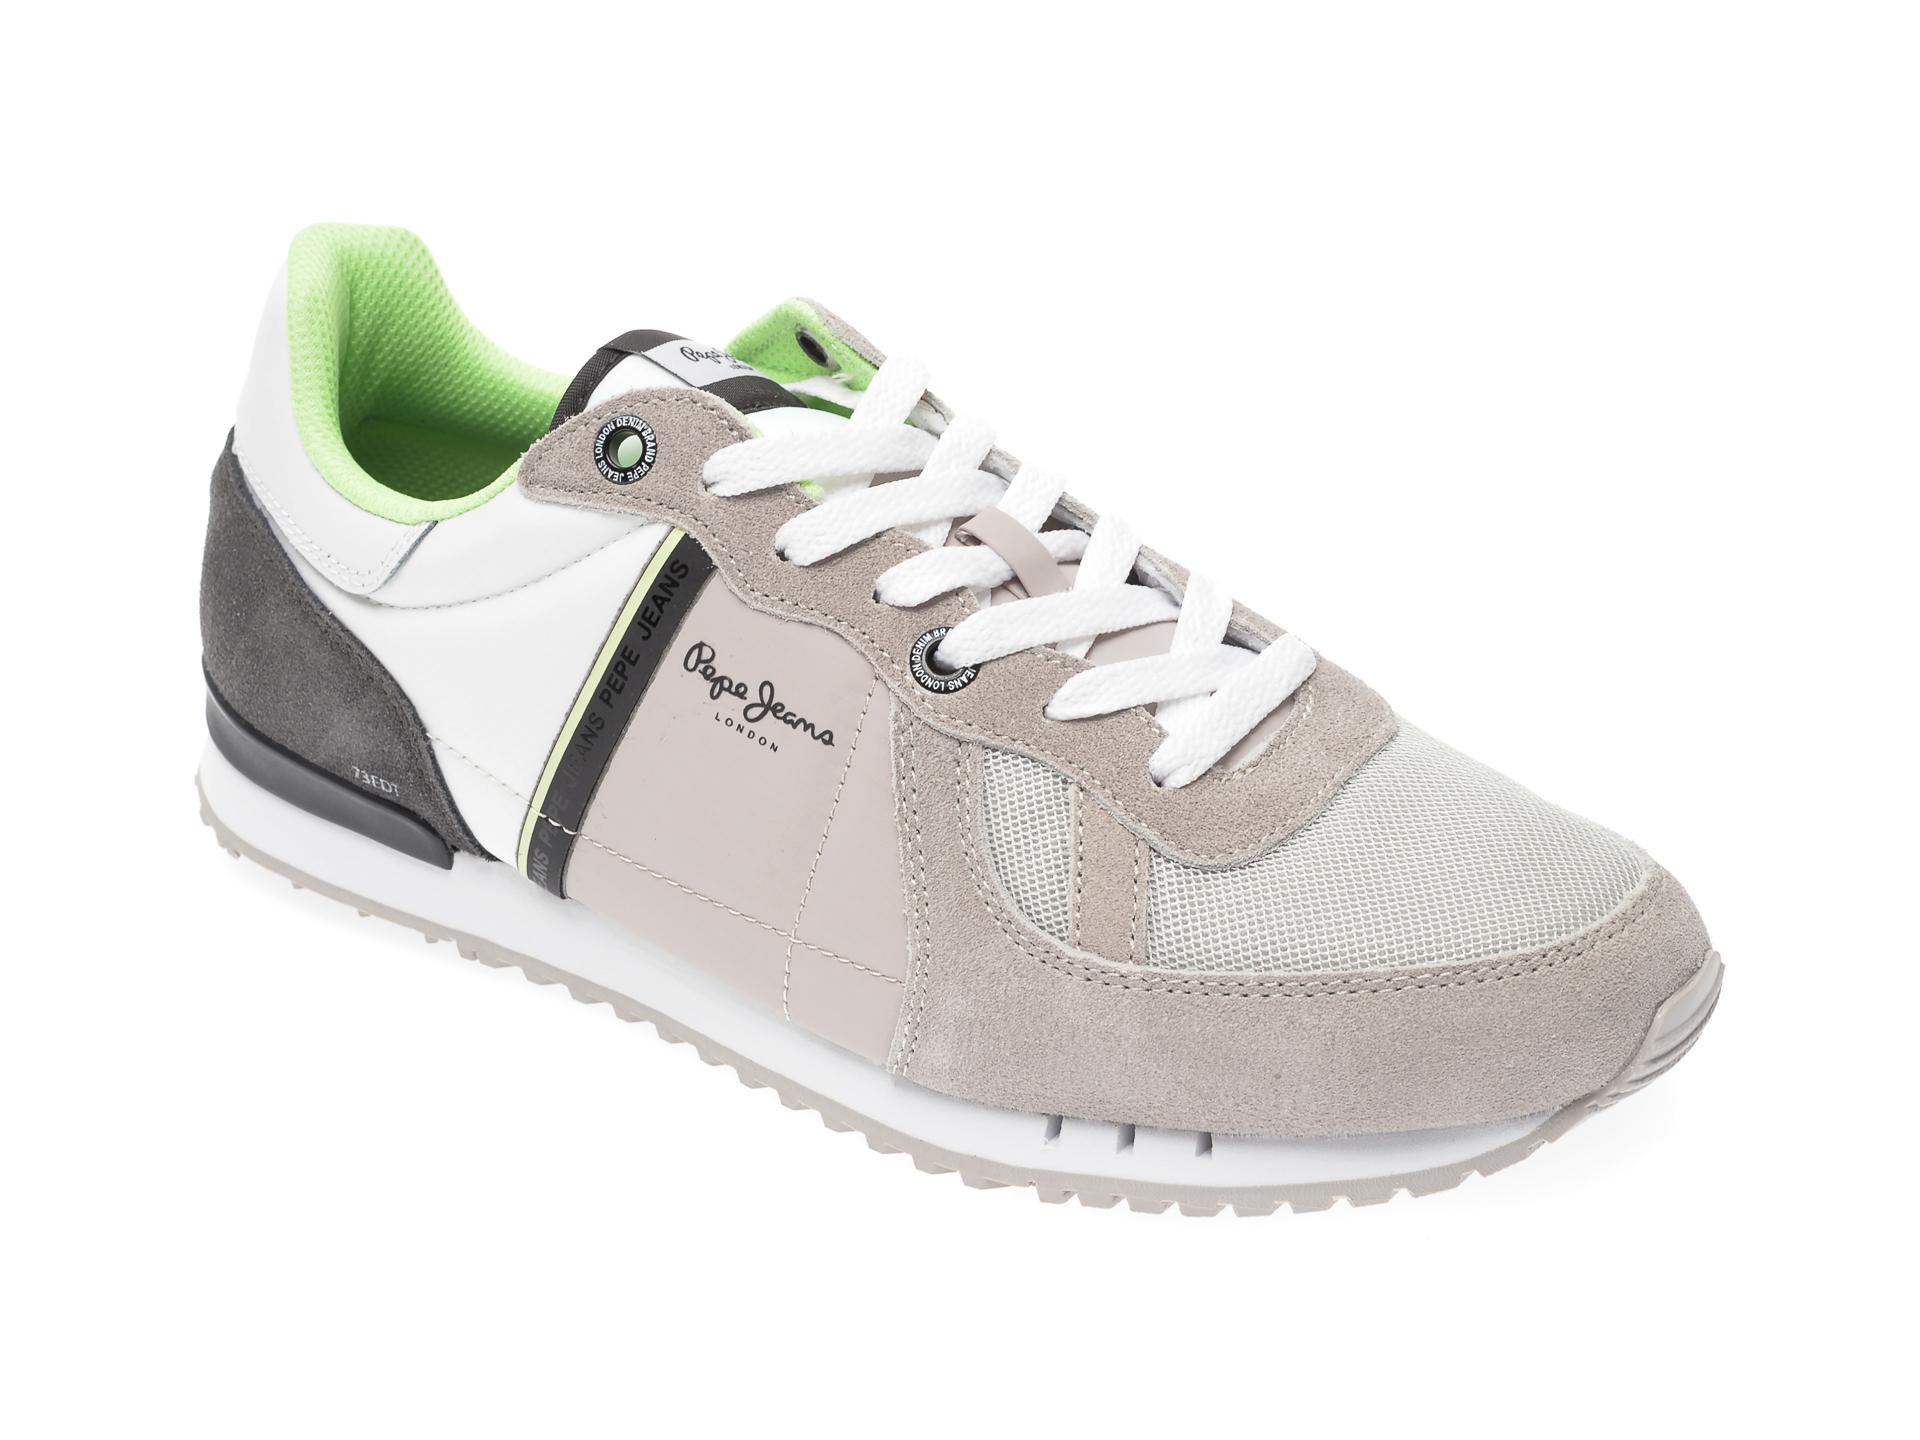 Pantofi sport PEPE JEANS gri, MS30612, din material textil si piele intoarsa imagine